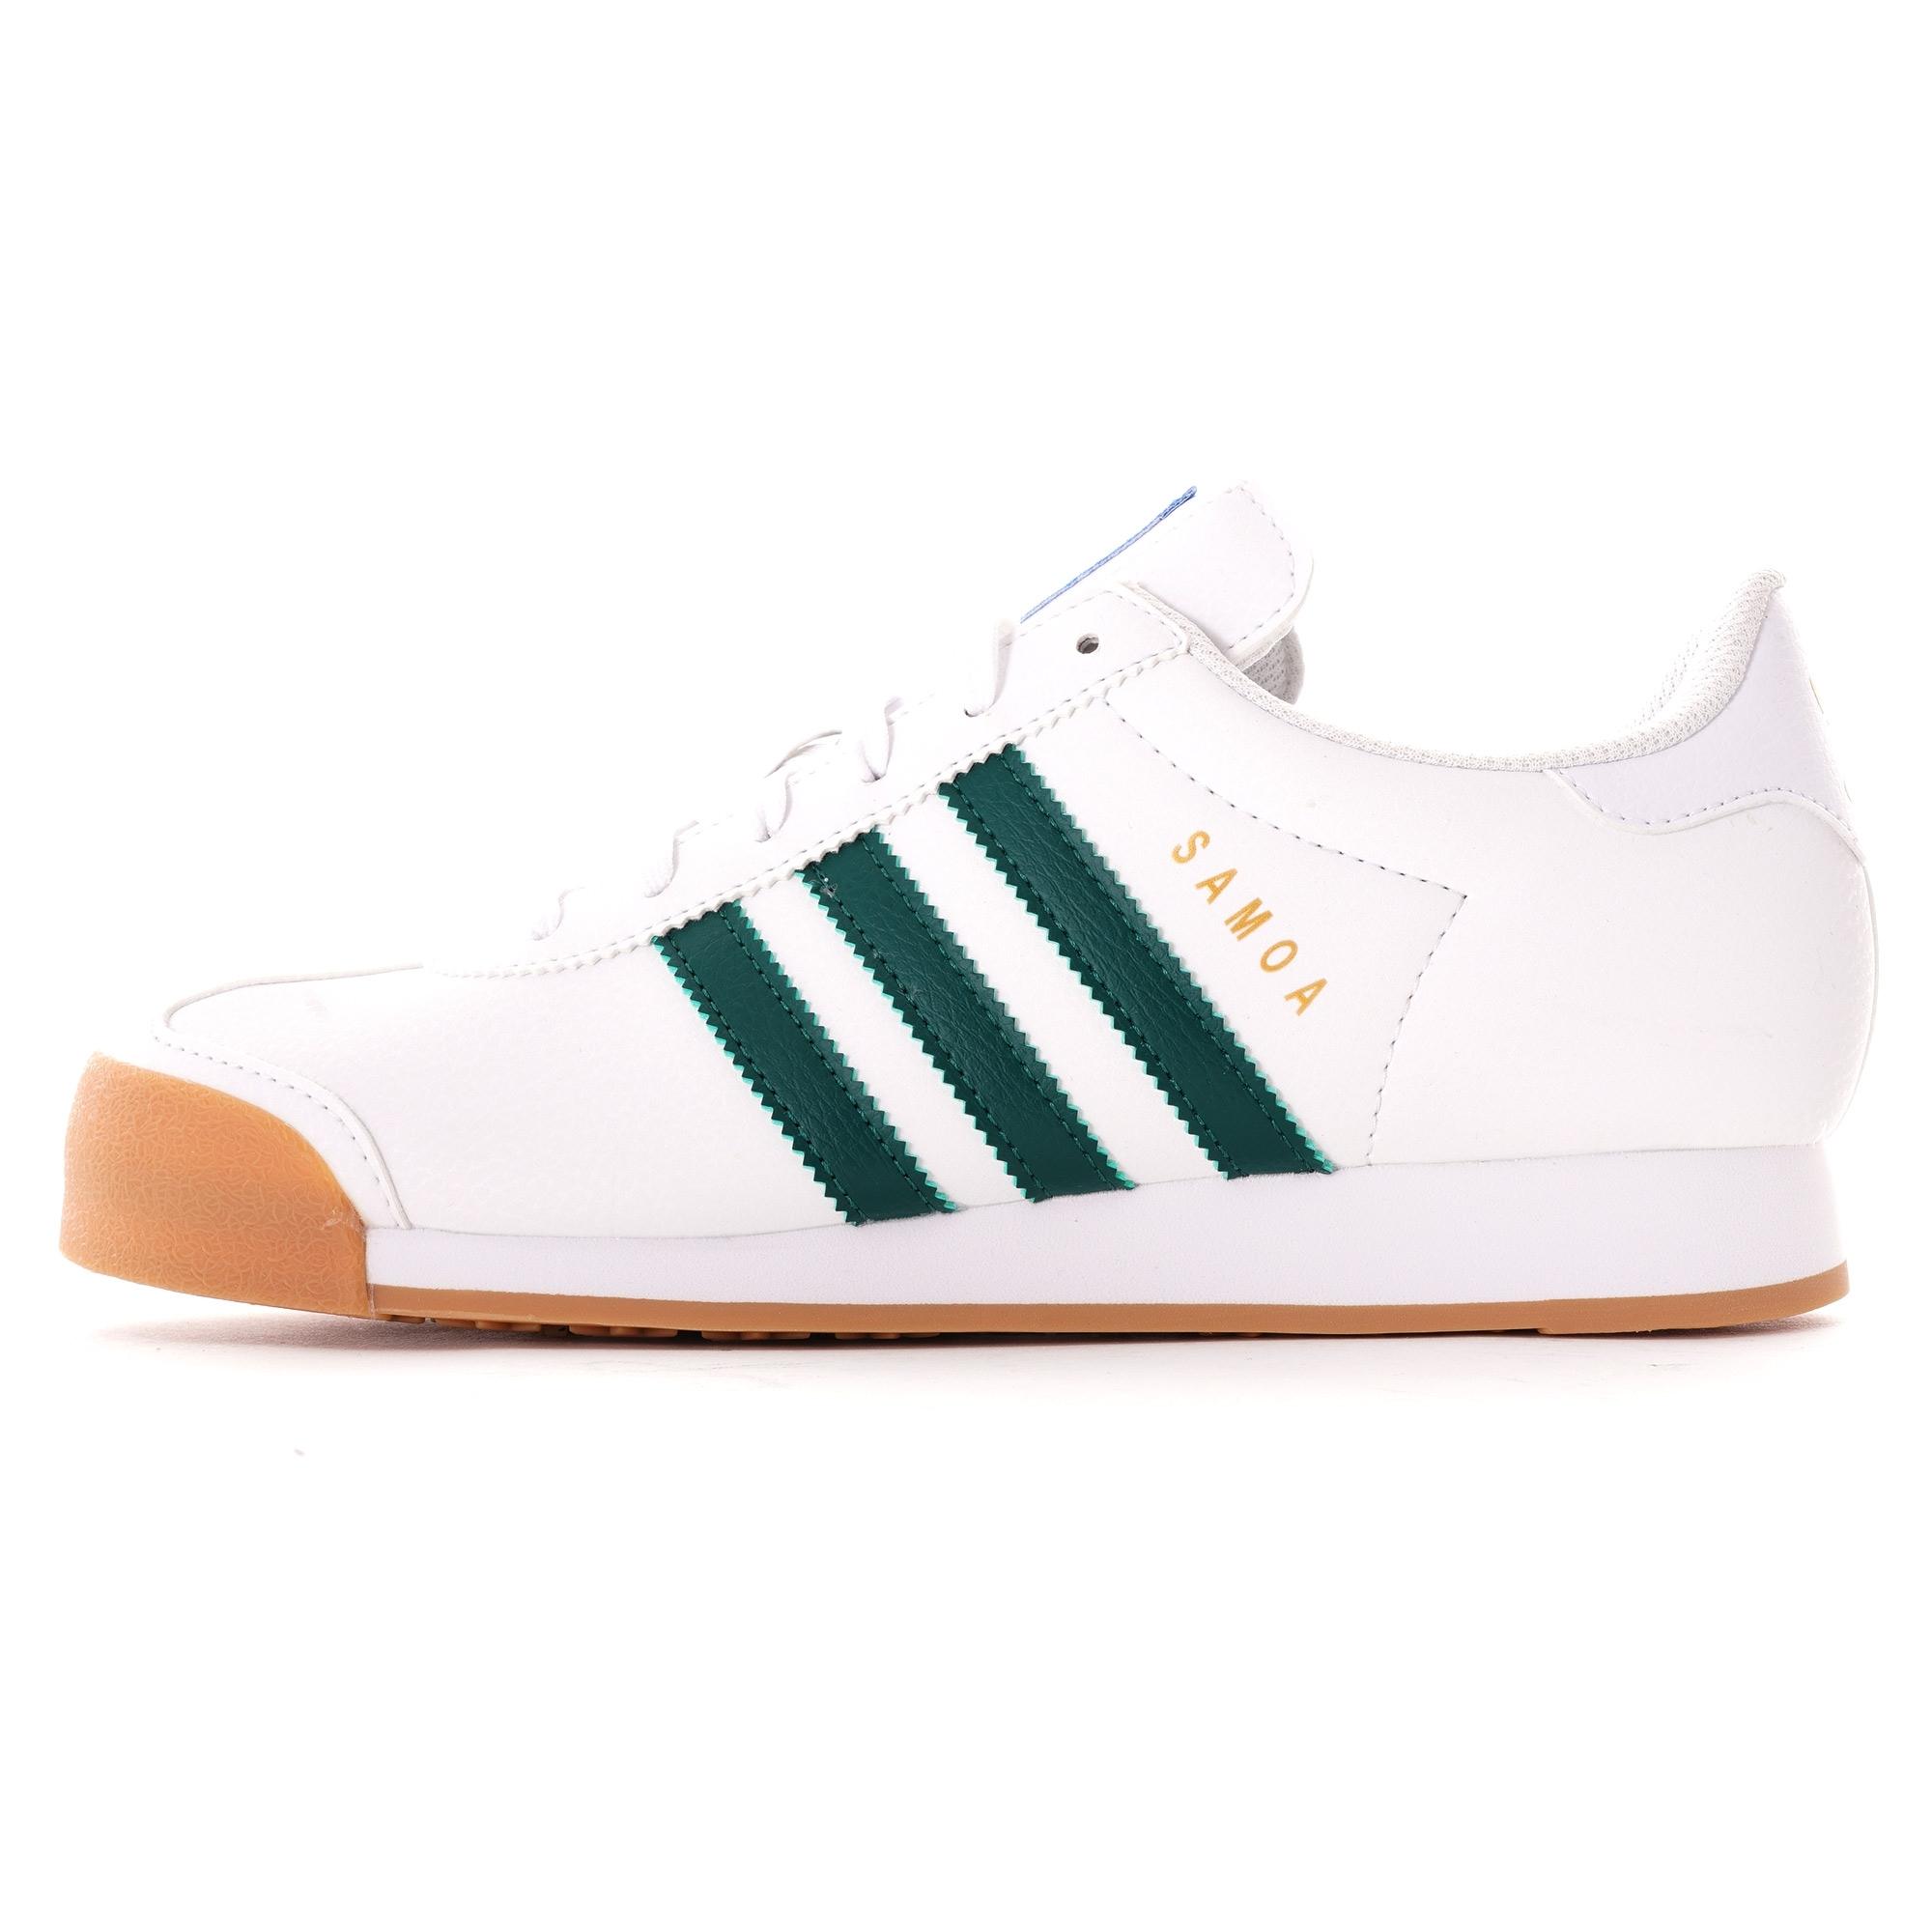 adidas Samoa Shoes | White/Green | EG6089